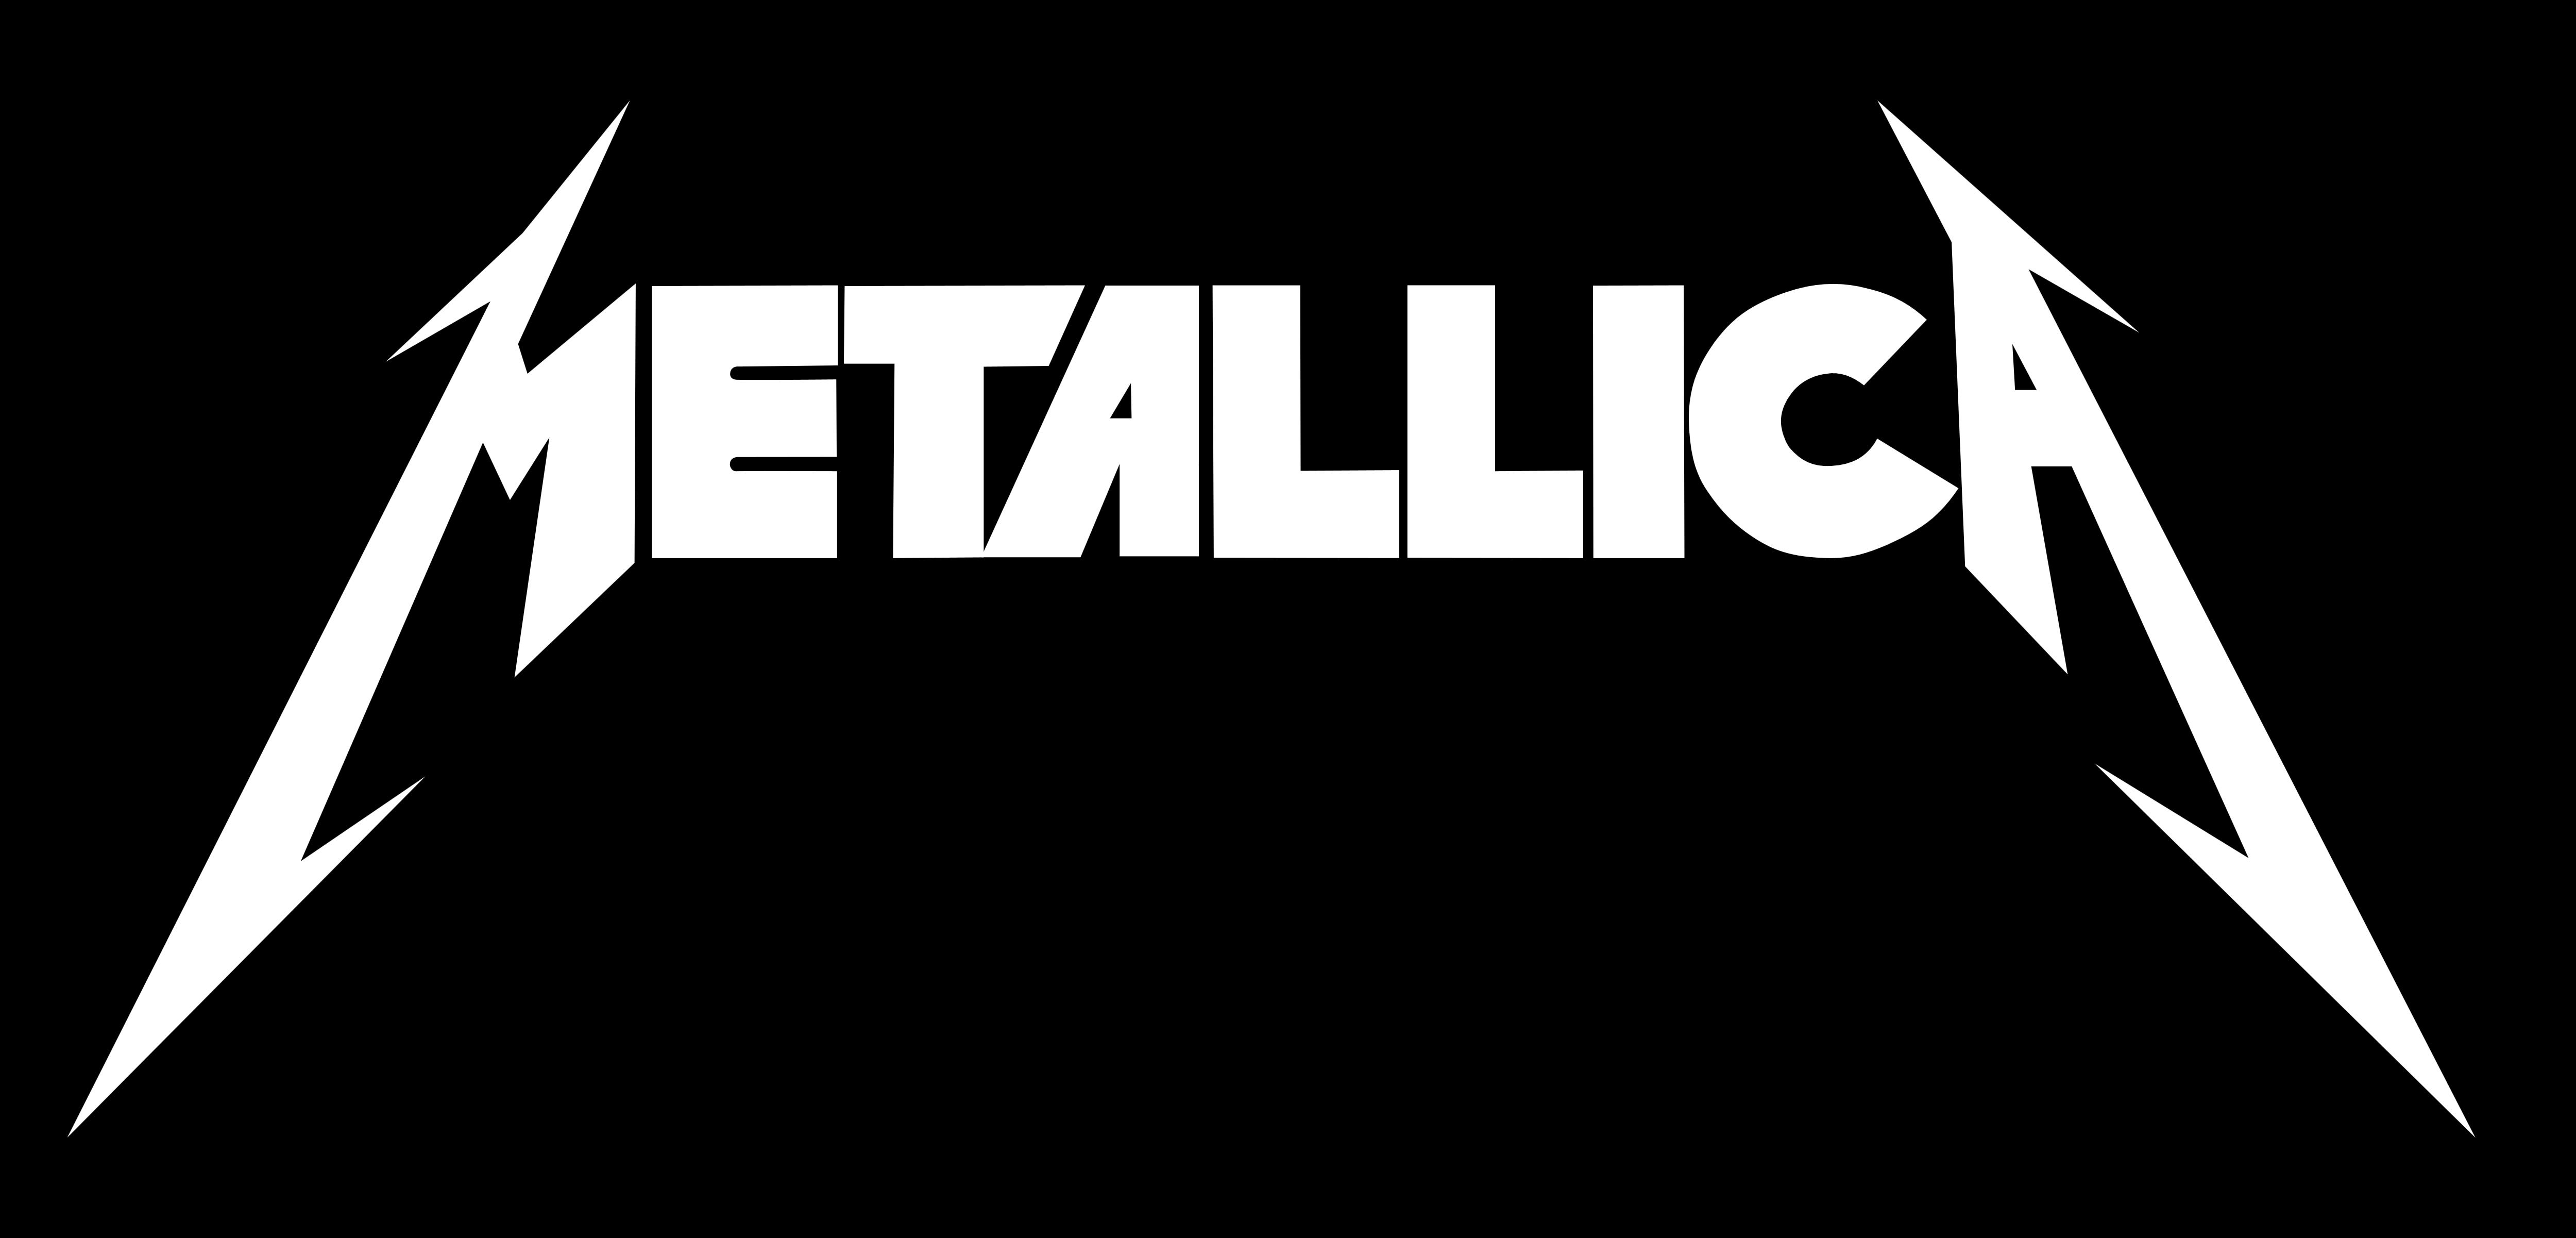 Metallica PNG - 115348